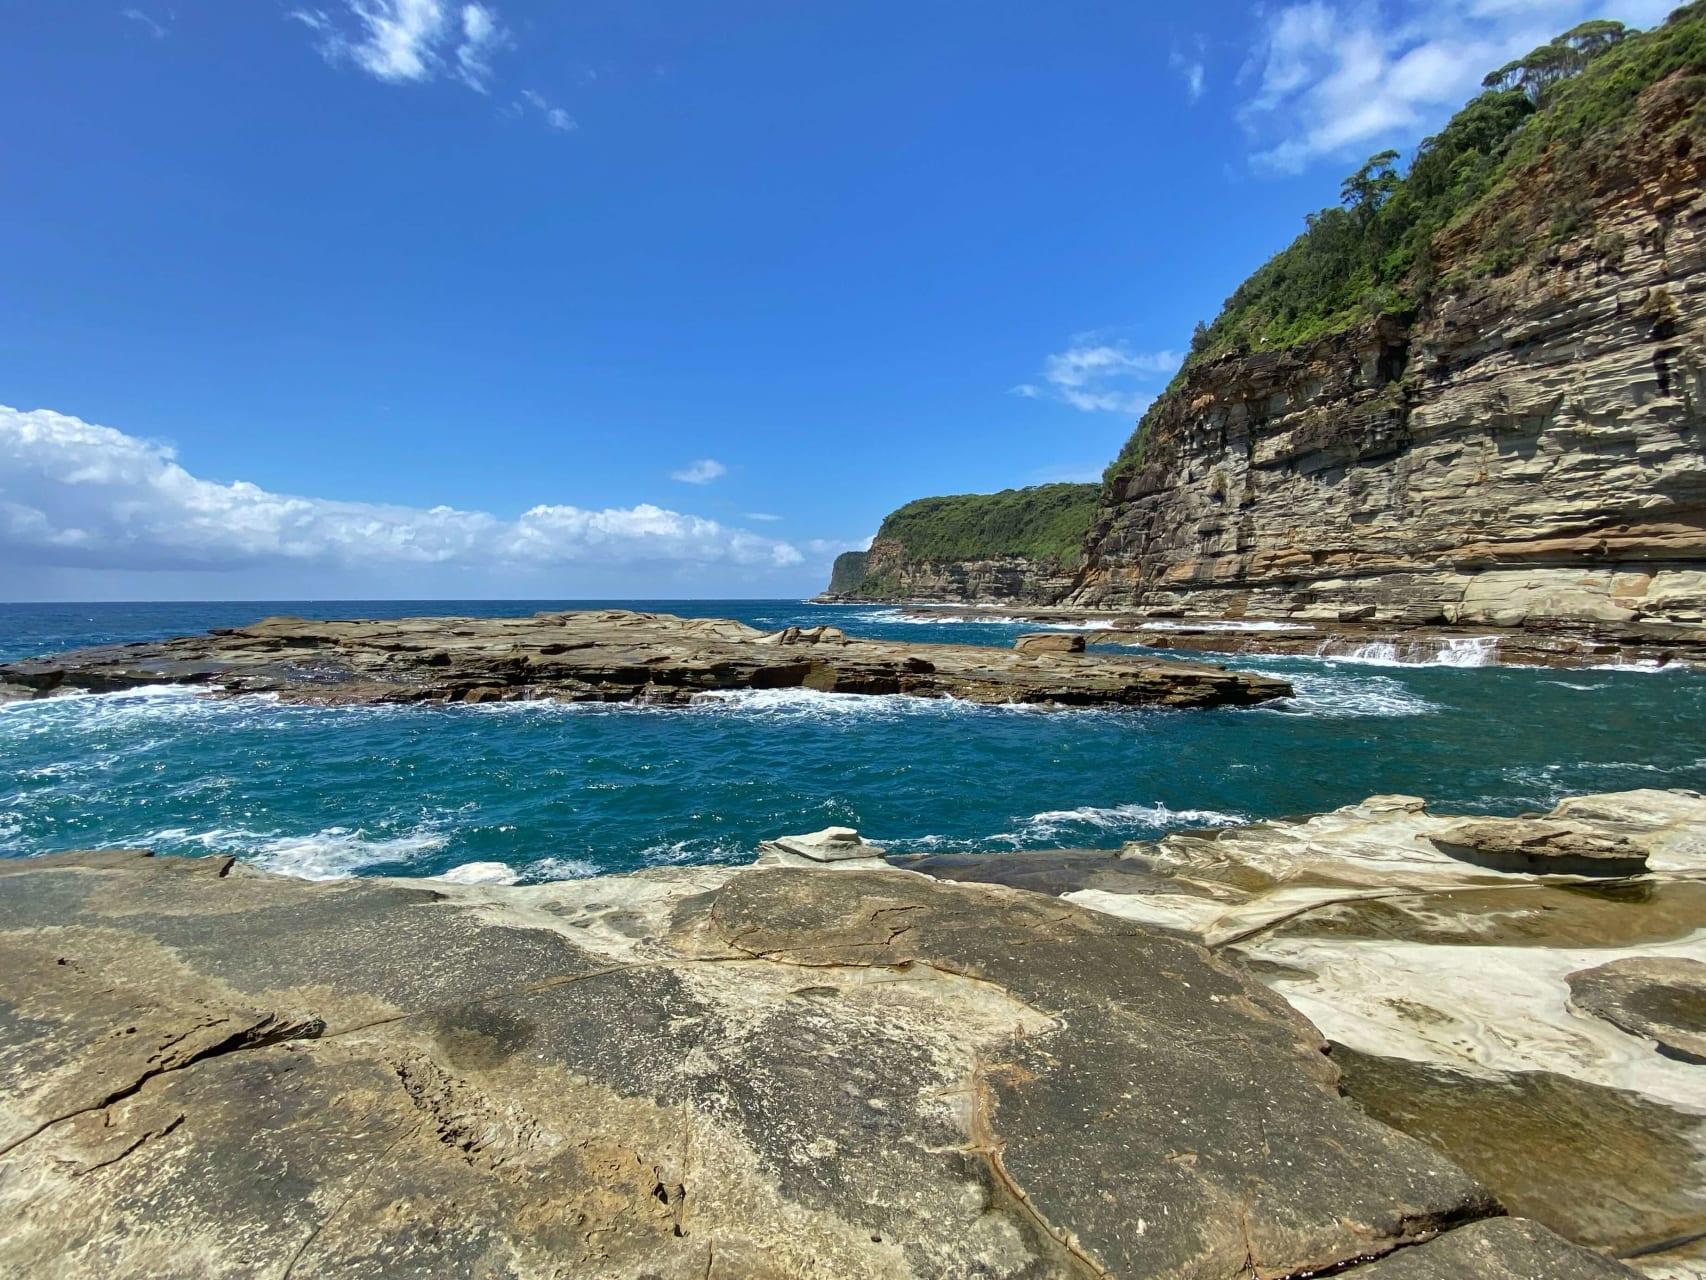 Sydney - Explore the Wild Australian Coast - Shark Island